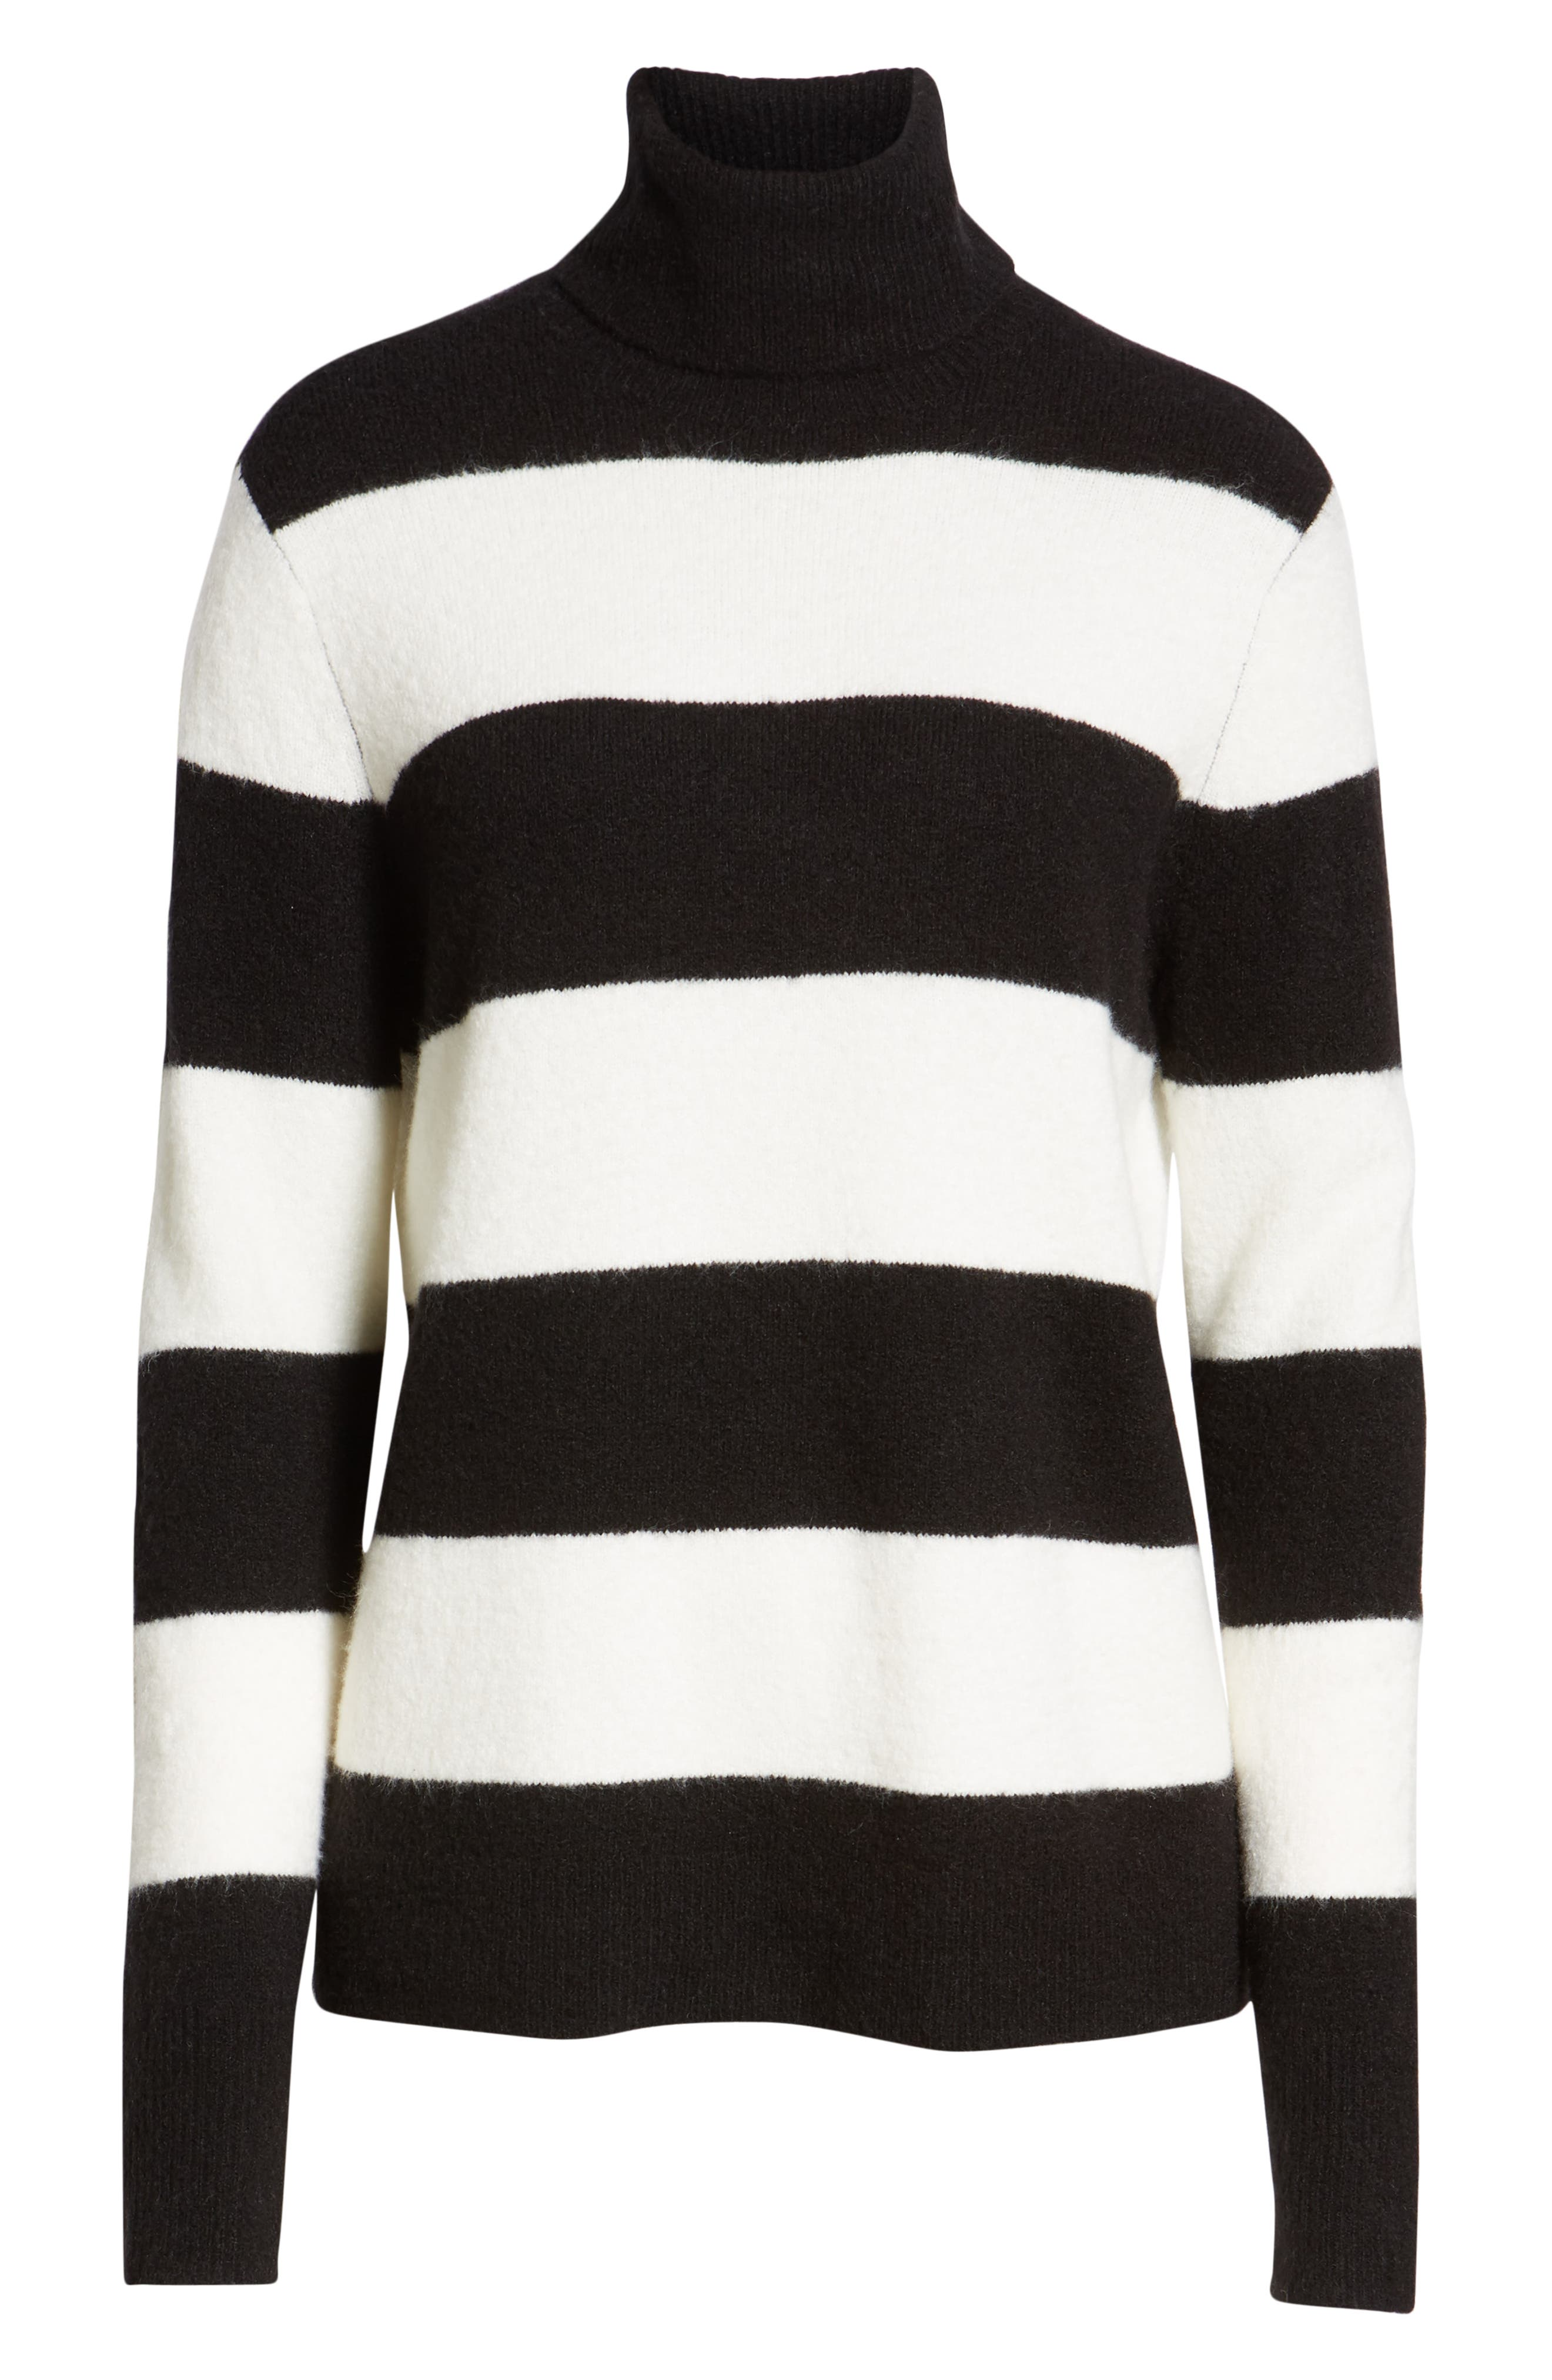 x Atlantic-Pacific Stripe Turtleneck Sweater,                             Alternate thumbnail 7, color,                             BLACK- IVORY STRIPE